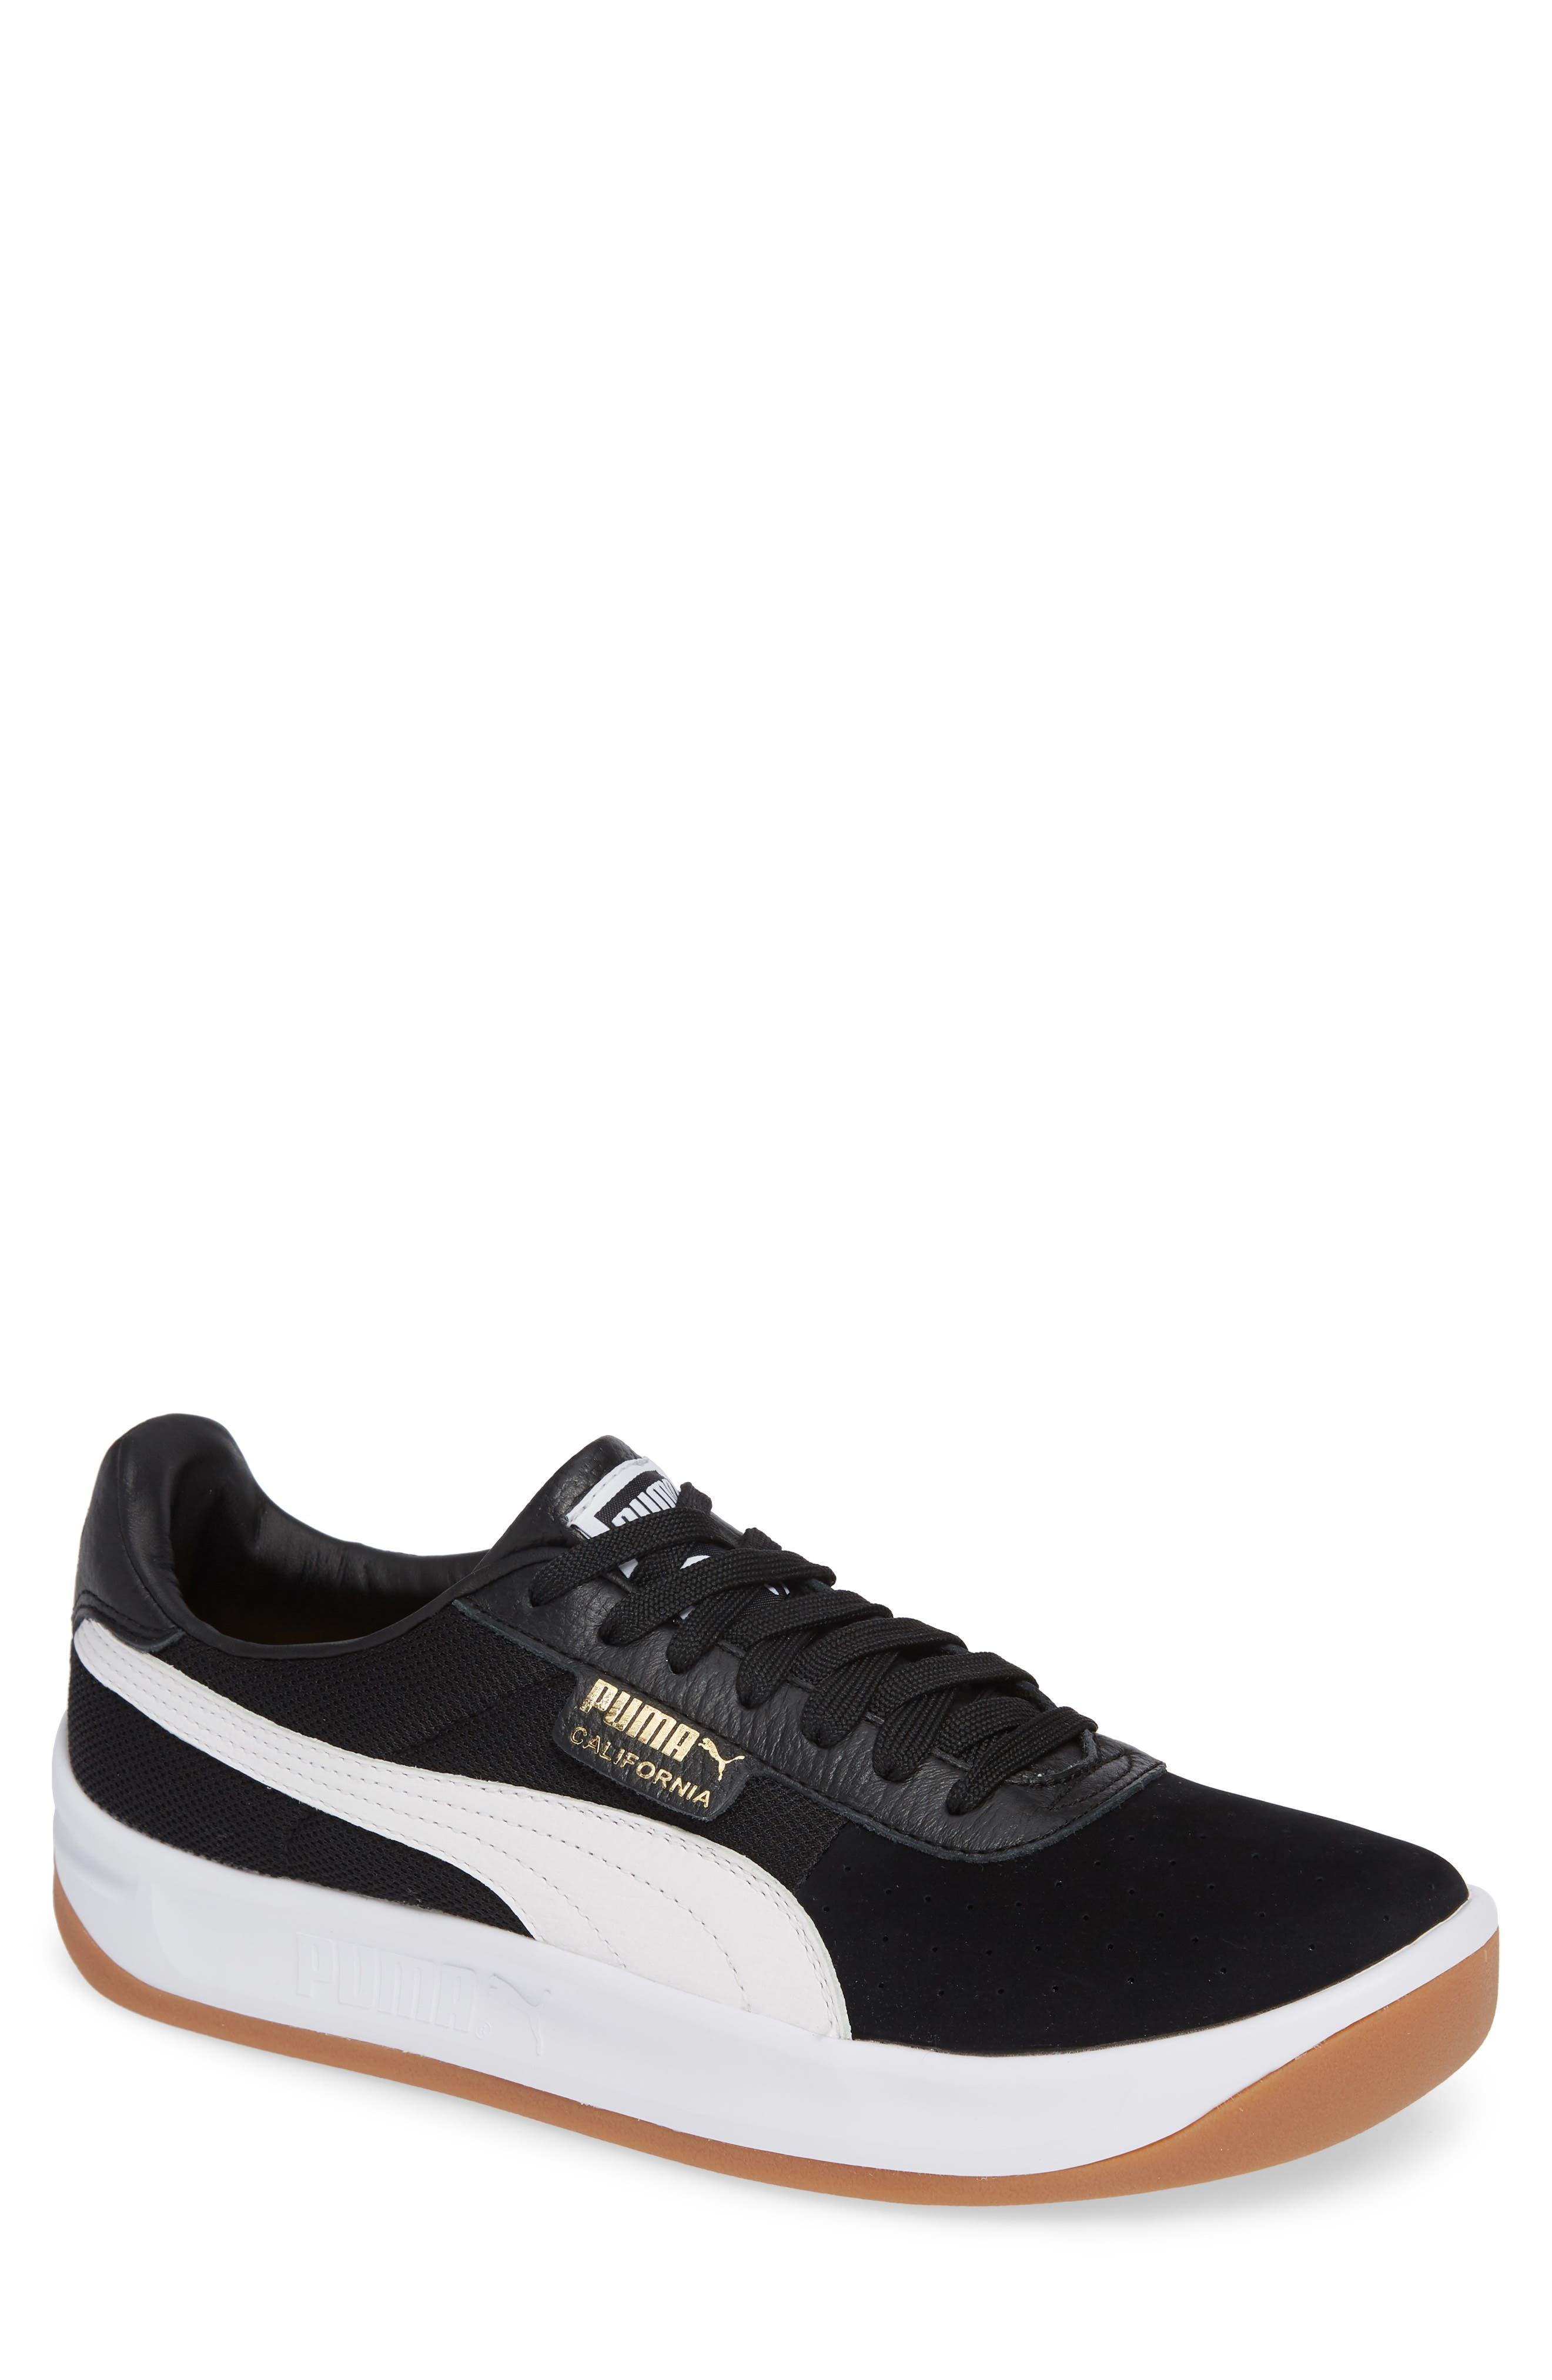 PUMA California Casual Sneaker, Main, color, 001